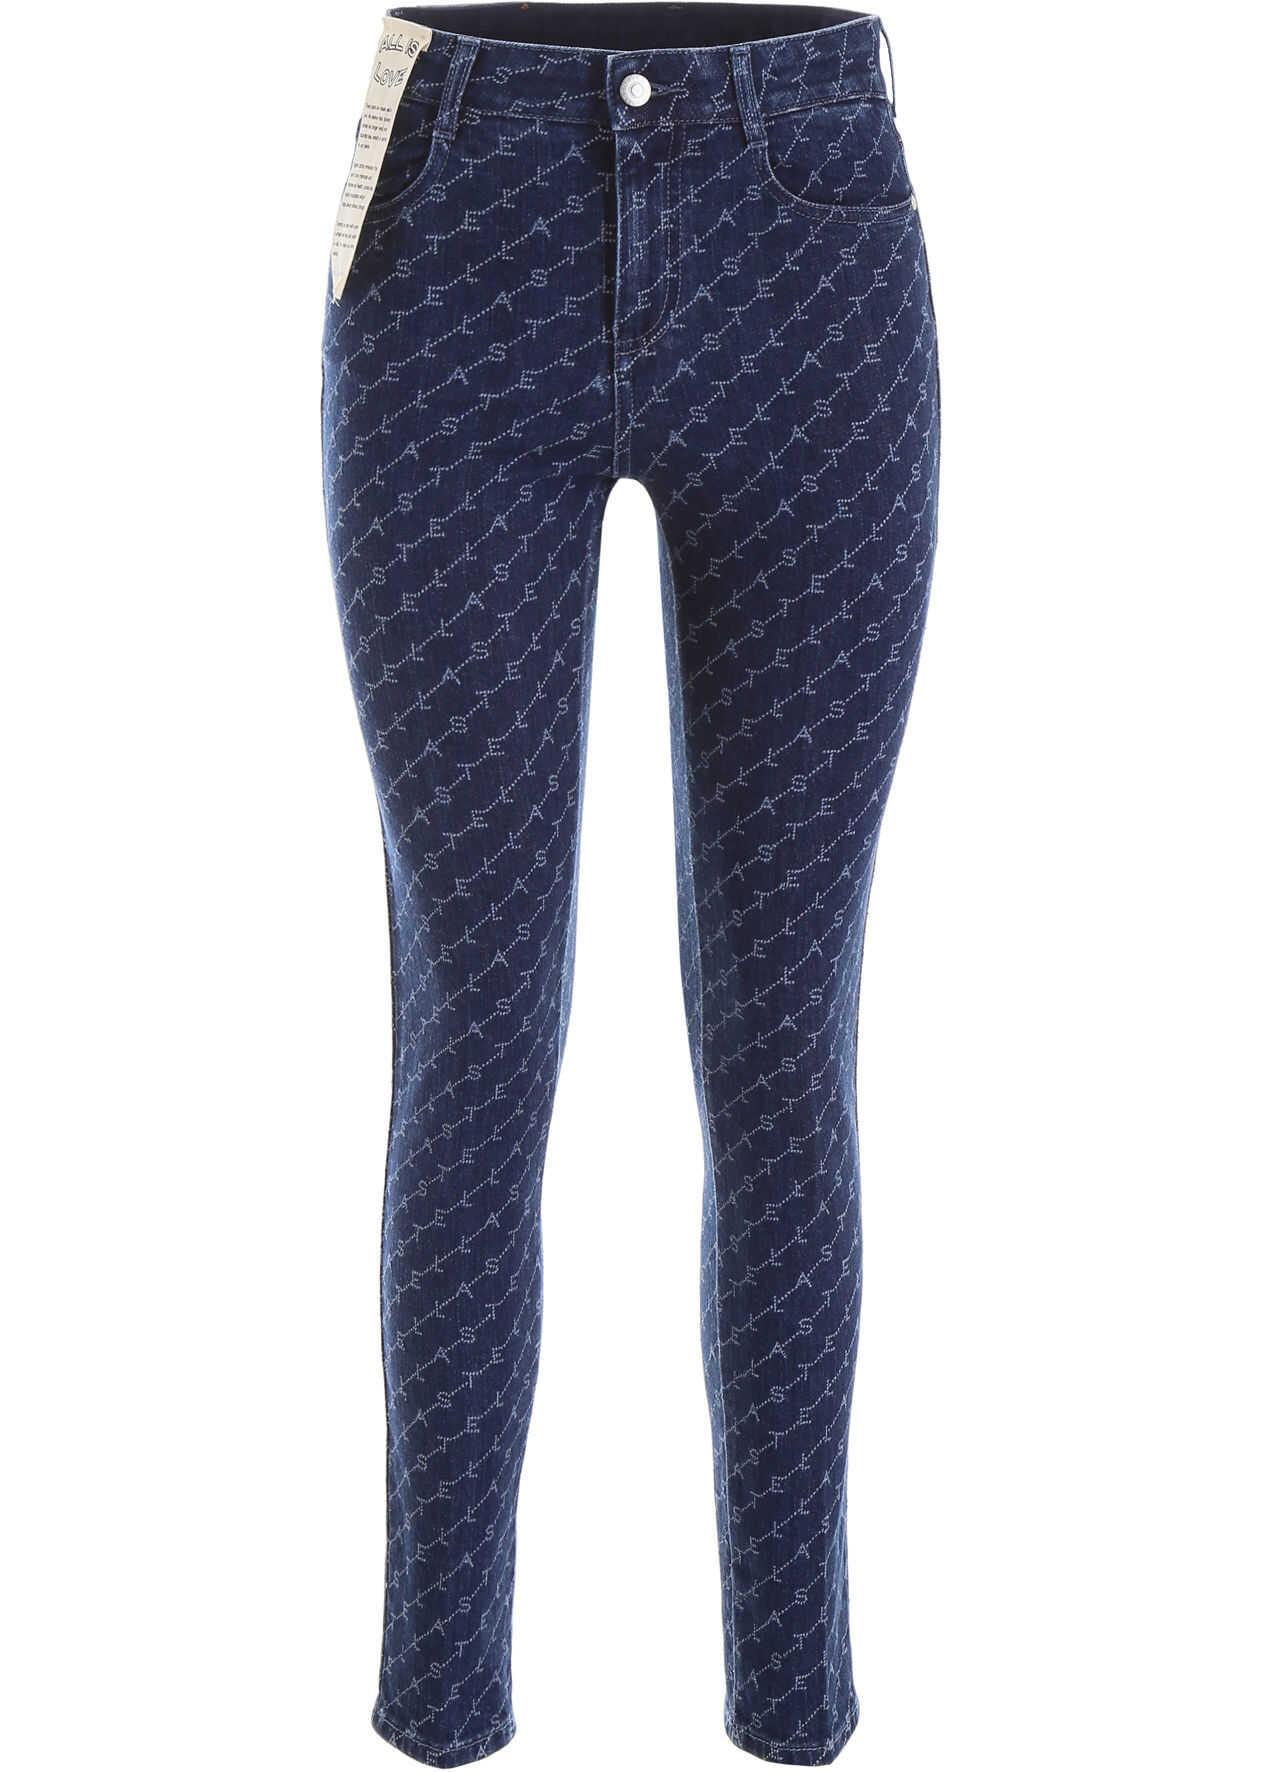 adidas by Stella McCartney Monogram Skinny Jeans DARKEST BLUE